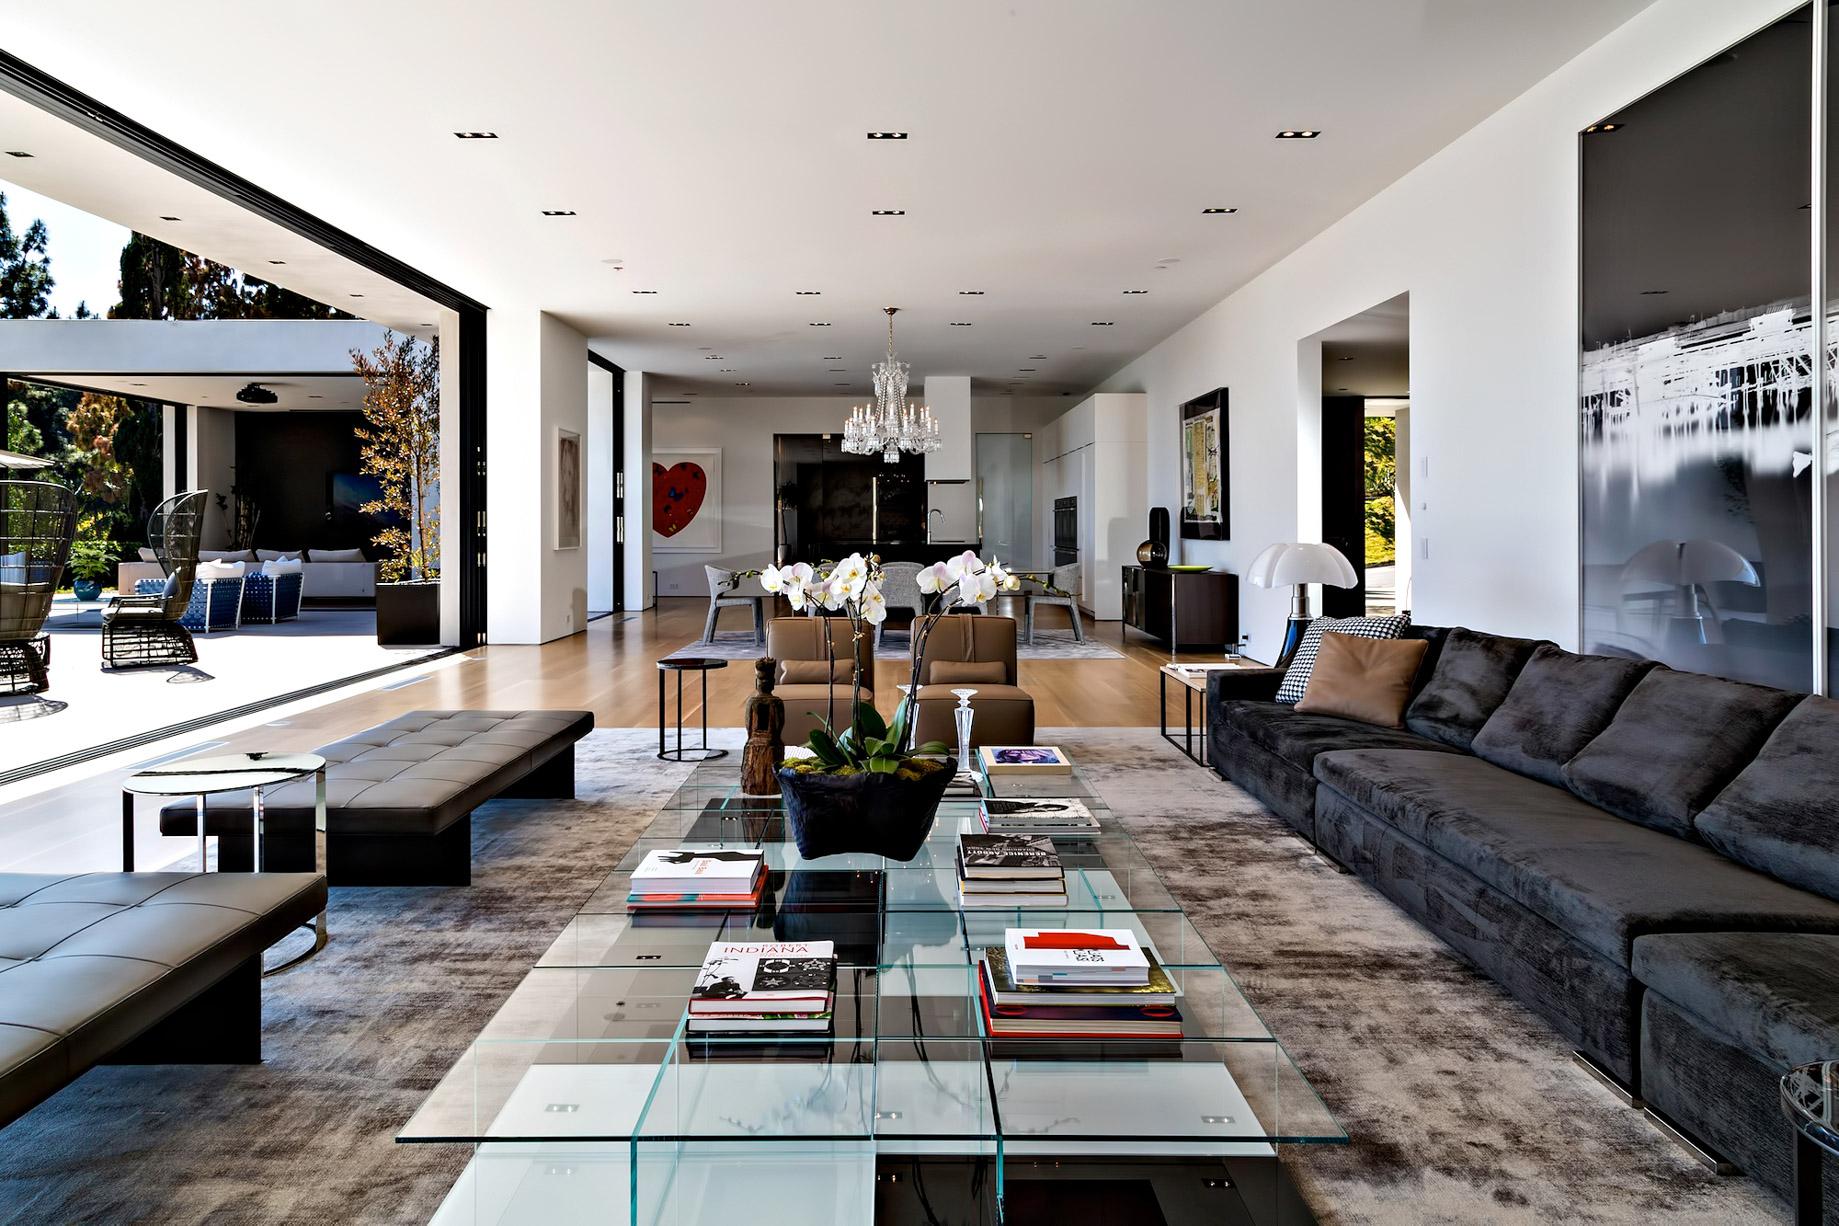 Trousdale Luxury Modern - 1220 Loma Vista Dr, Beverly Hills, CA, USA